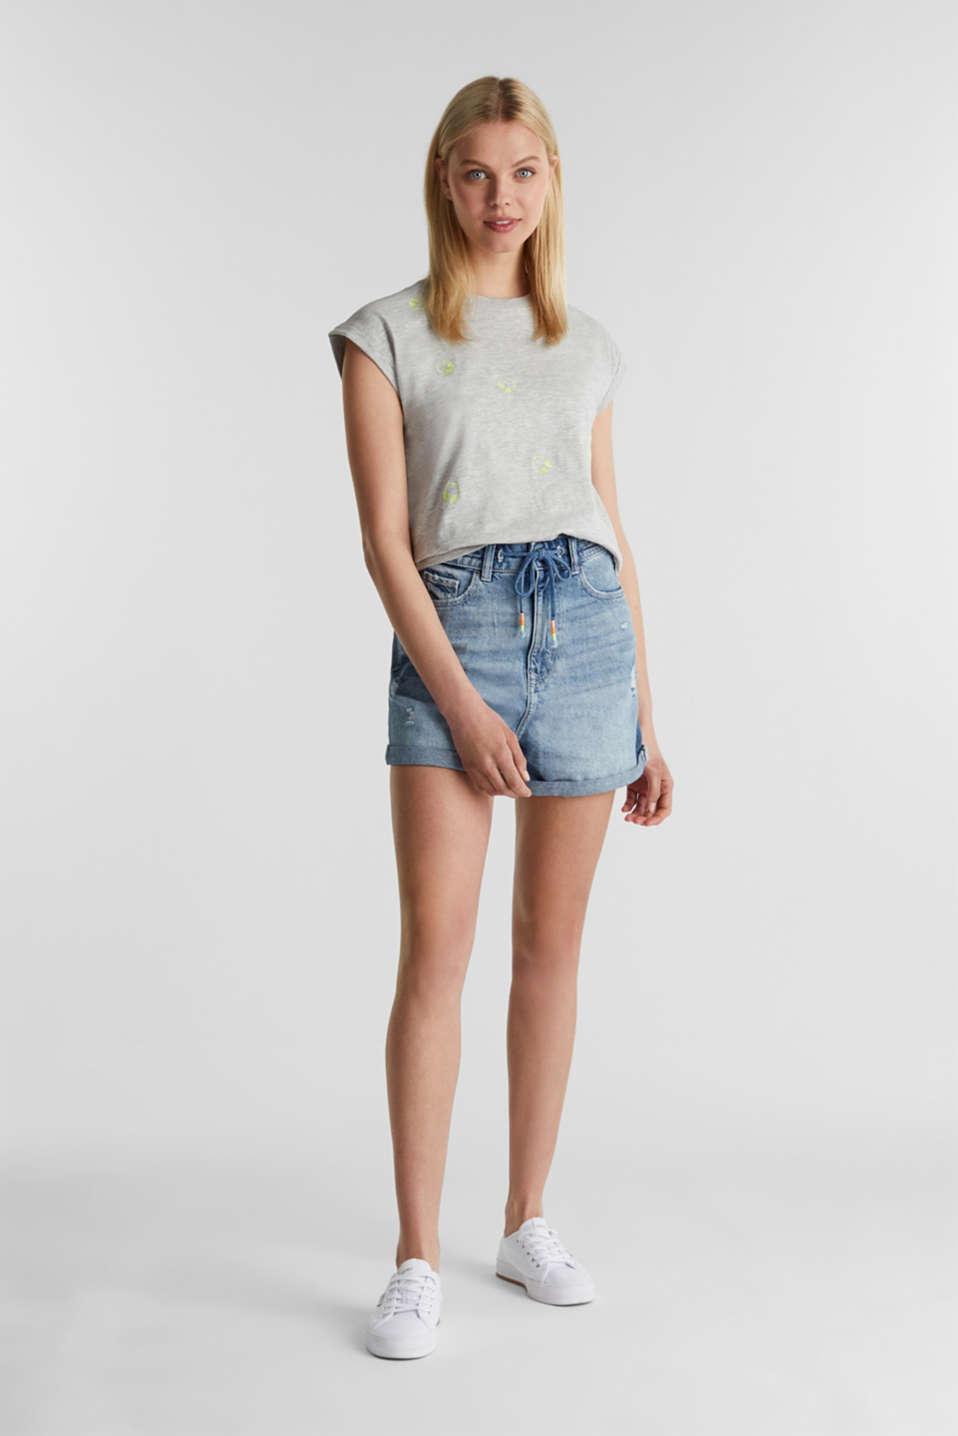 Trendy top, organic cotton, LIGHT GREY 5, detail image number 1